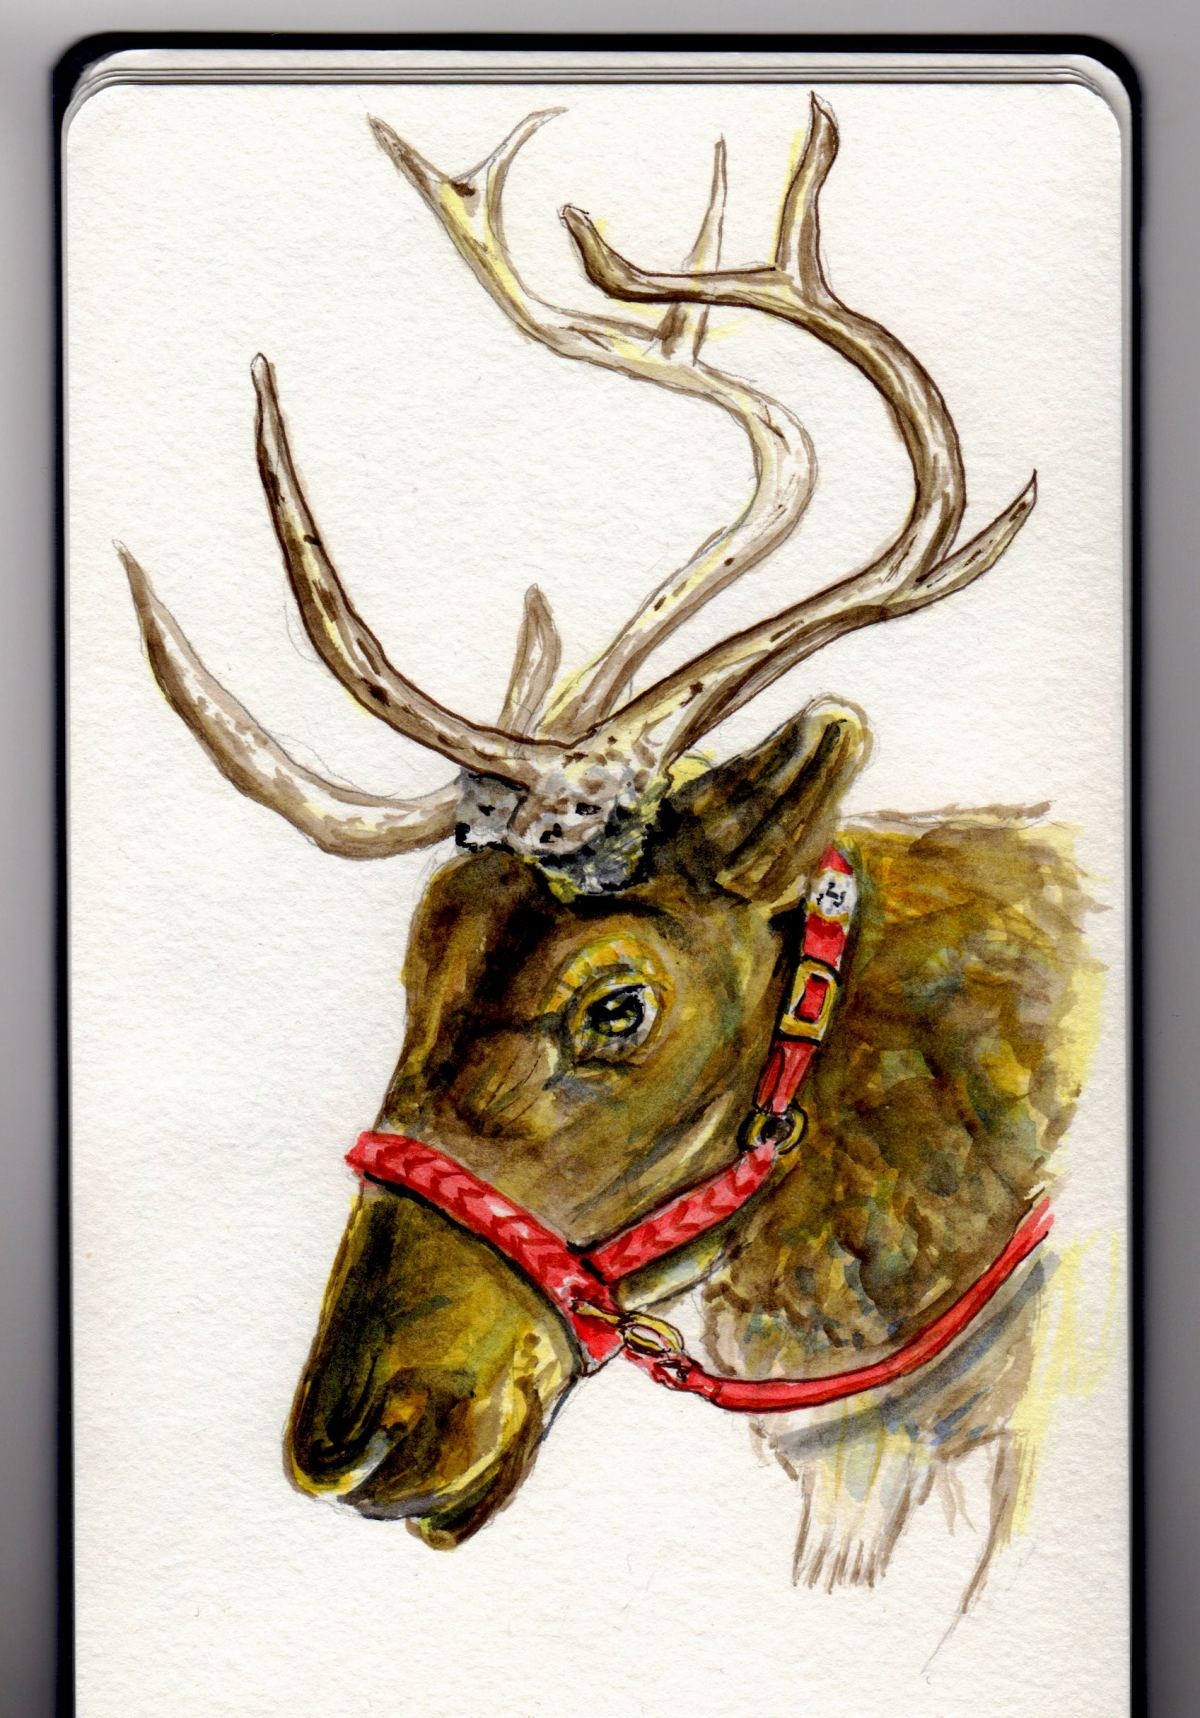 Randy the Reindeer - Doodlewash by Charlie O'Shields